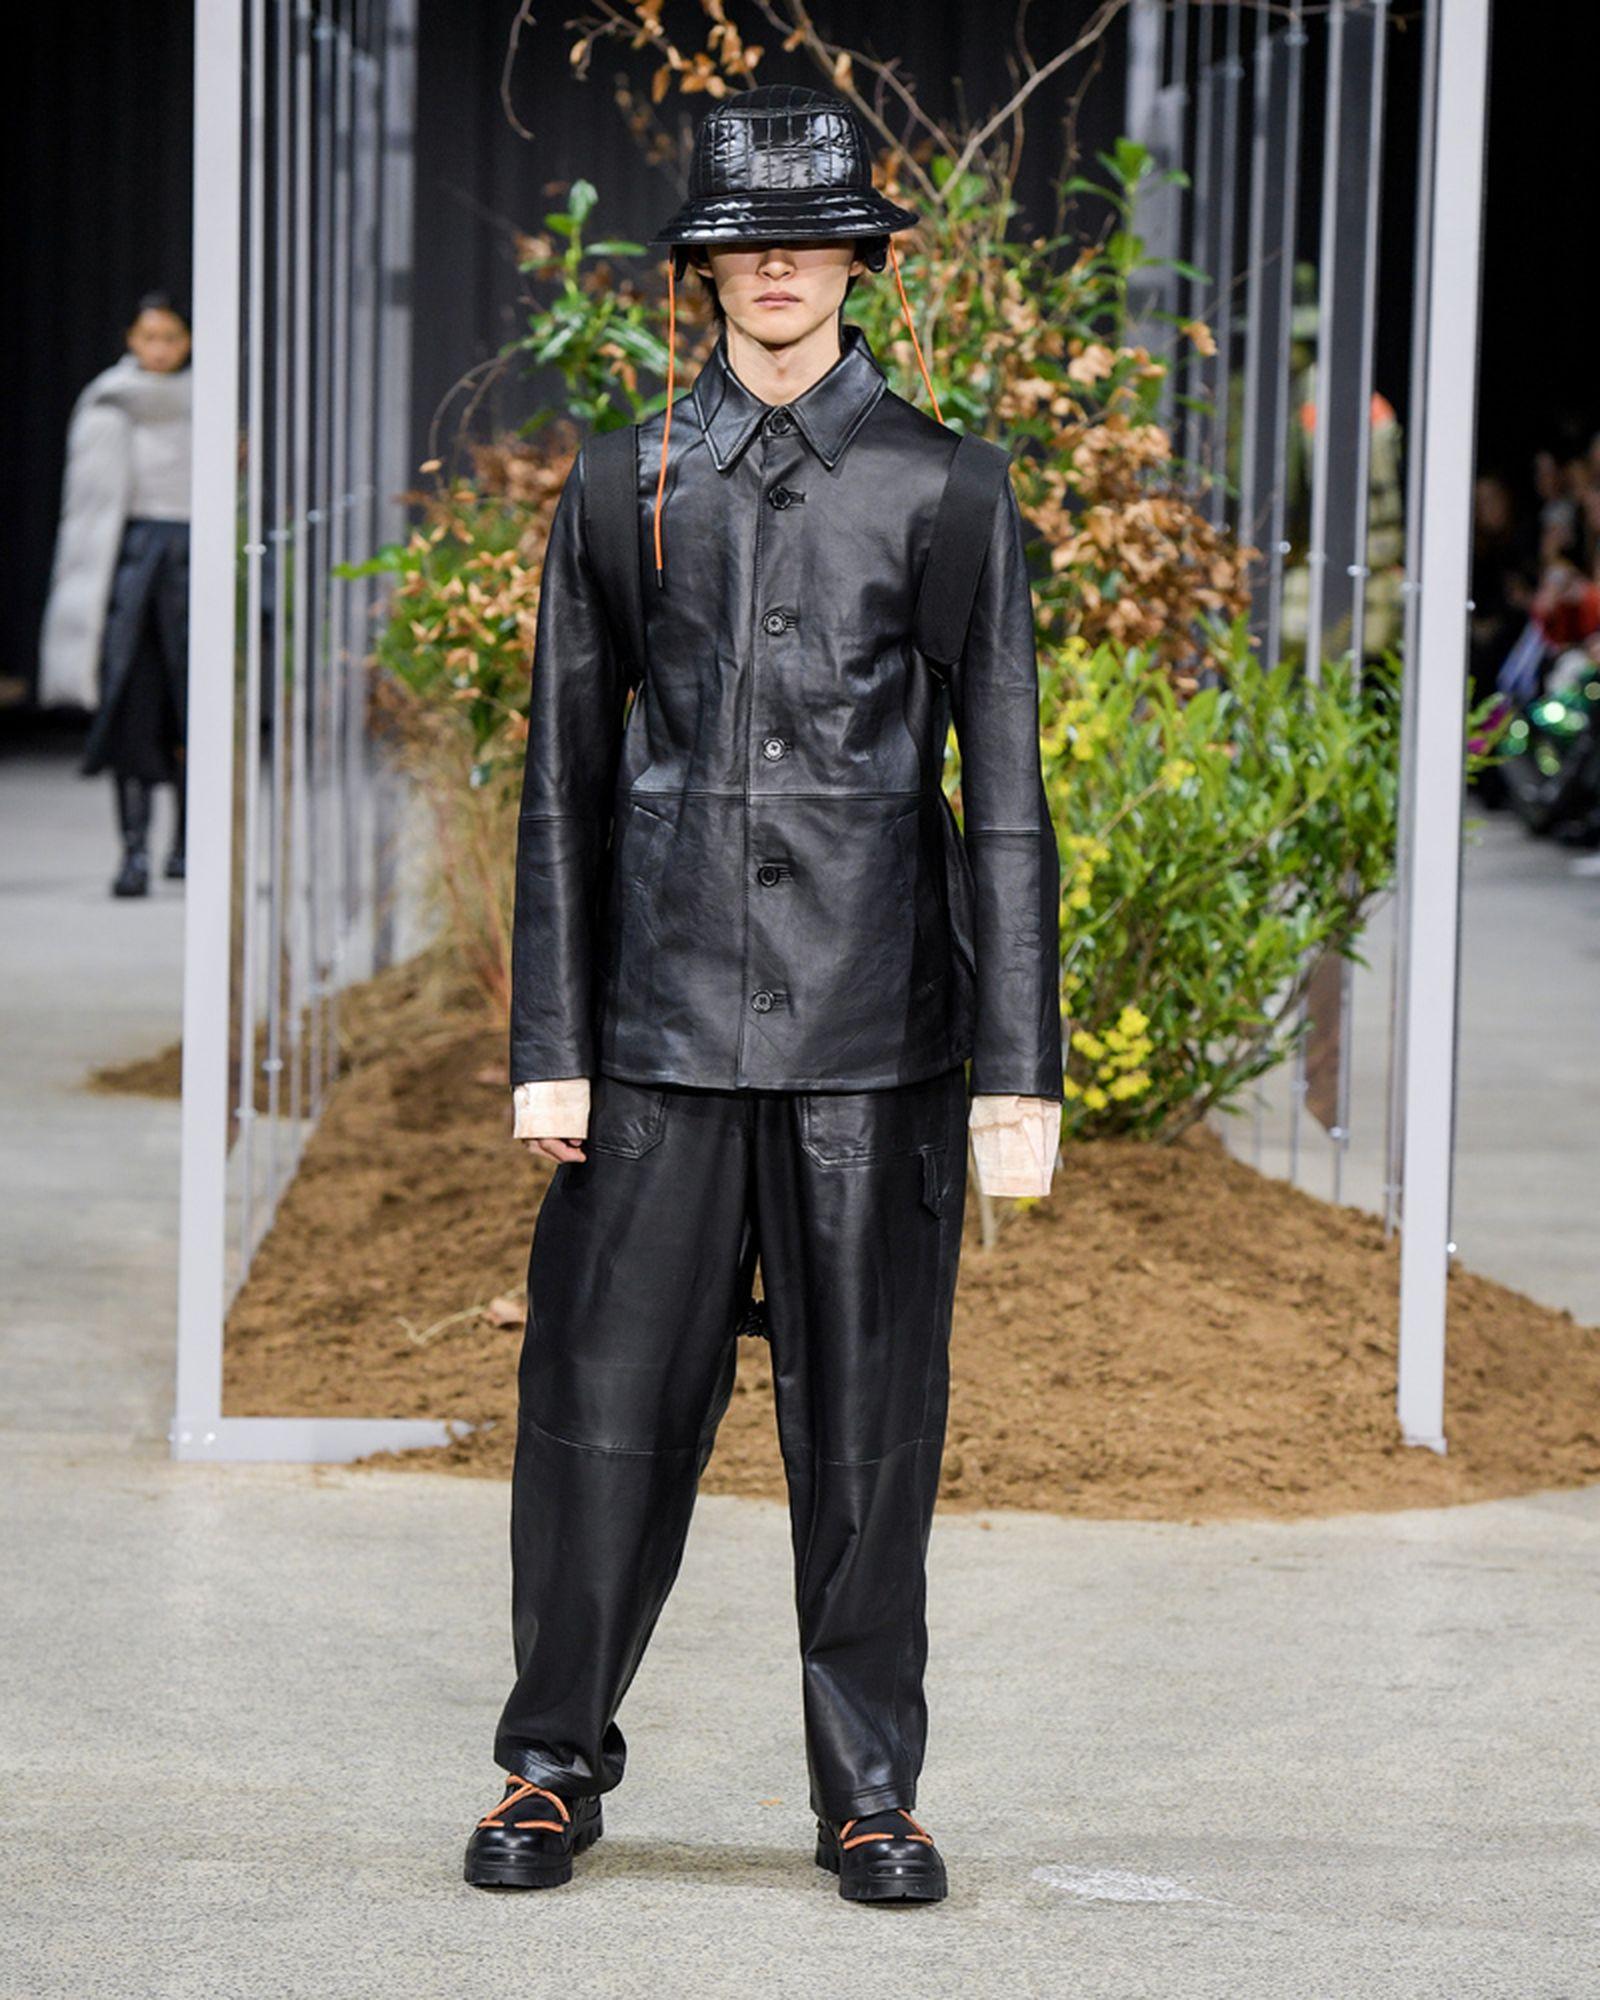 future-fashion-week-copenhagen-holz-2